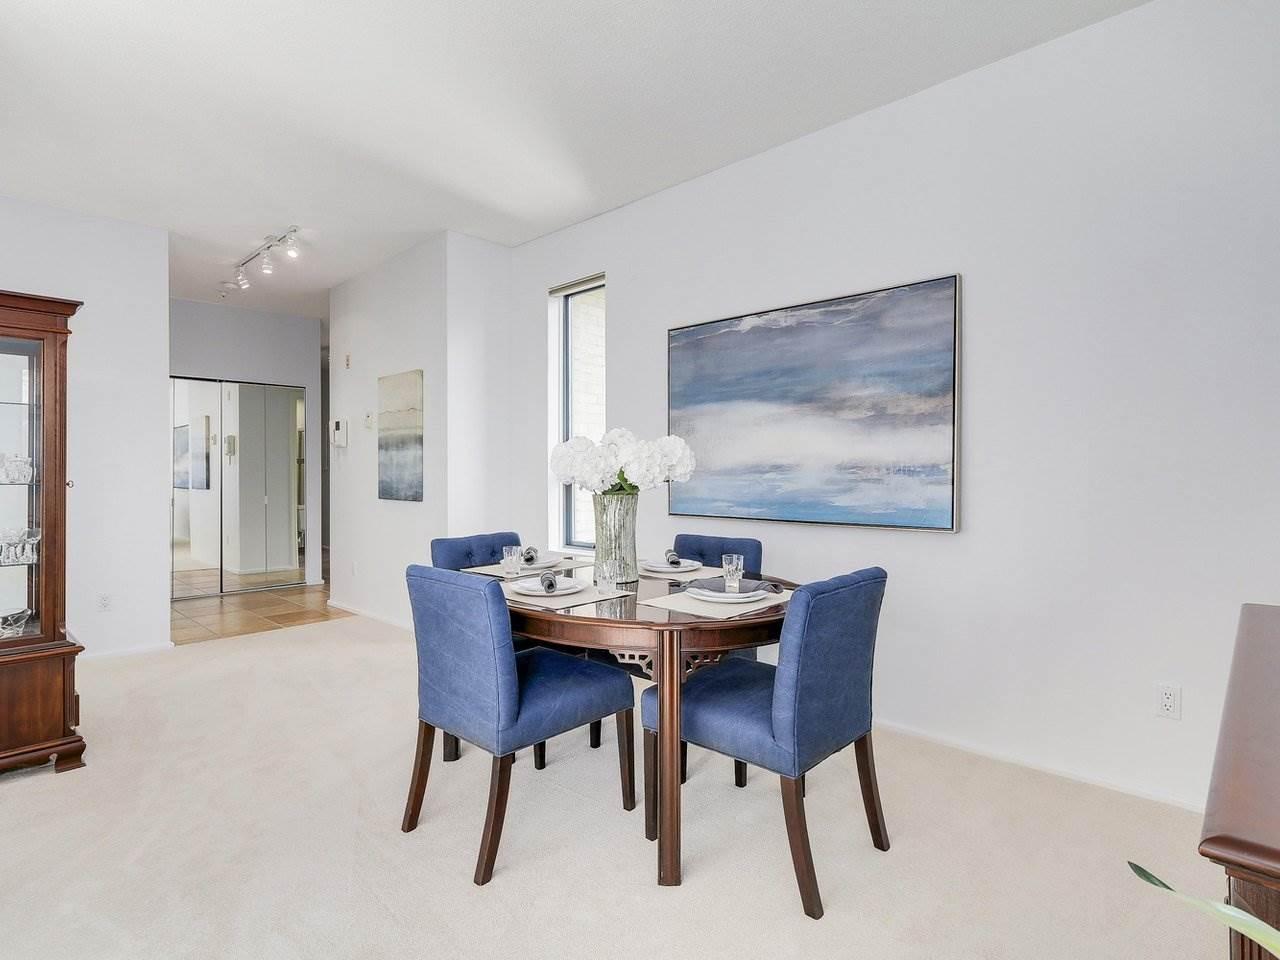 Condo Apartment at 301 2242 MARINE DRIVE, Unit 301, West Vancouver, British Columbia. Image 6